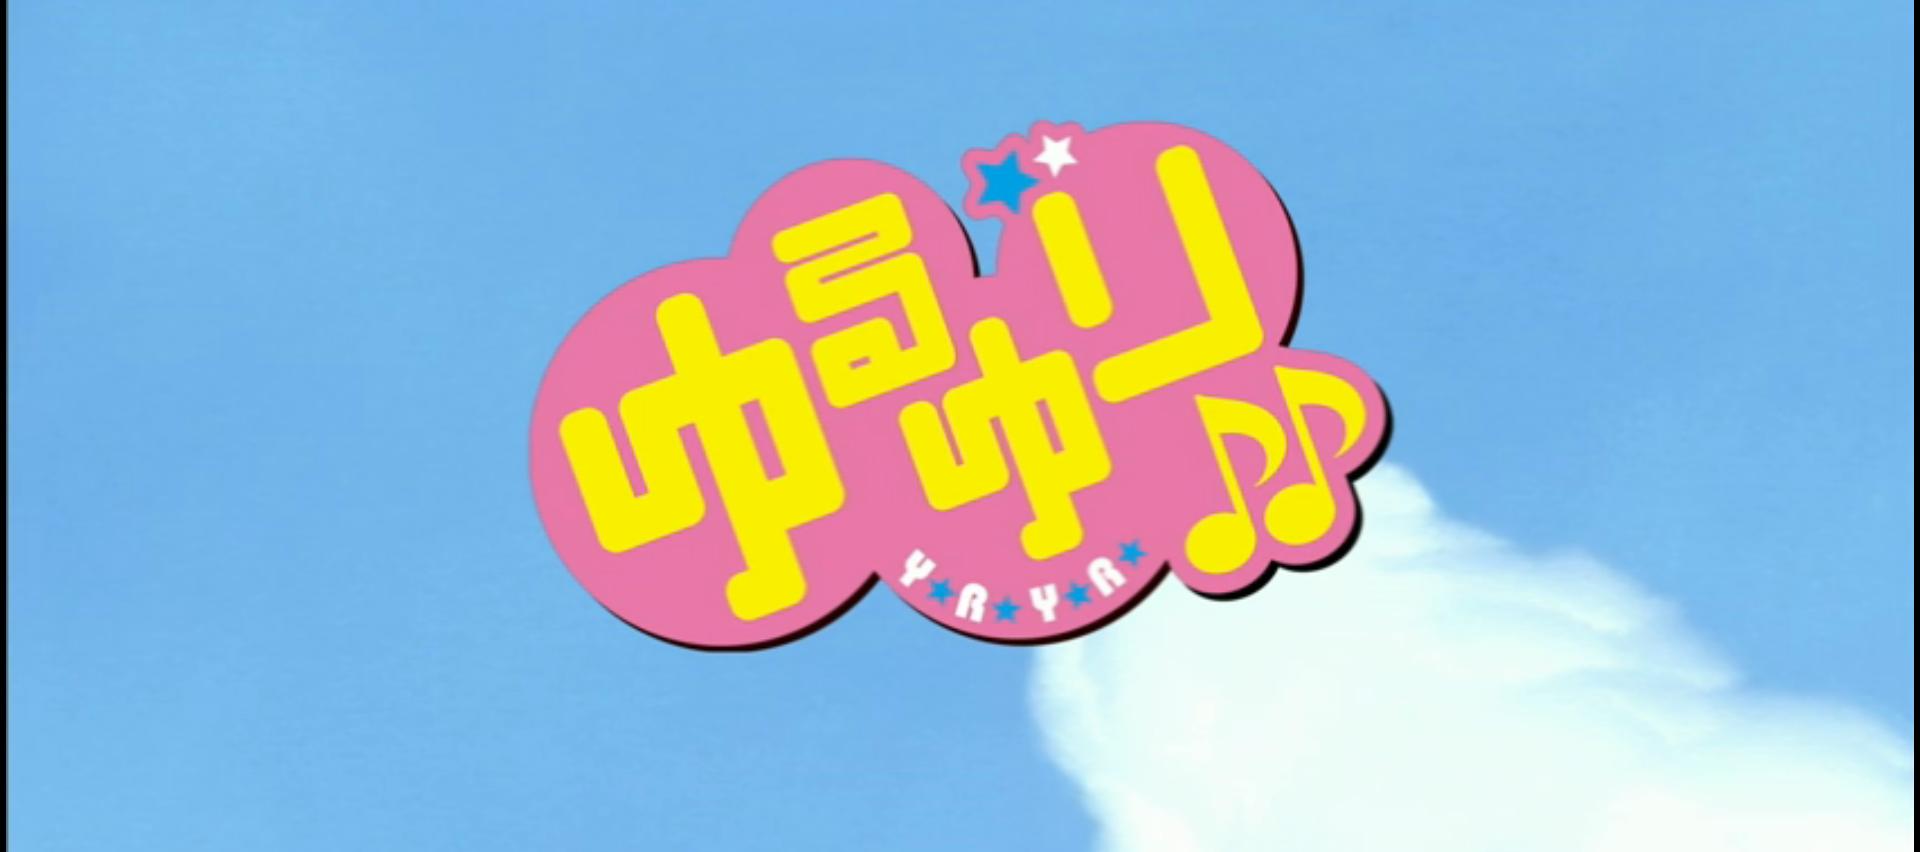 Yuru Yuri 2 title